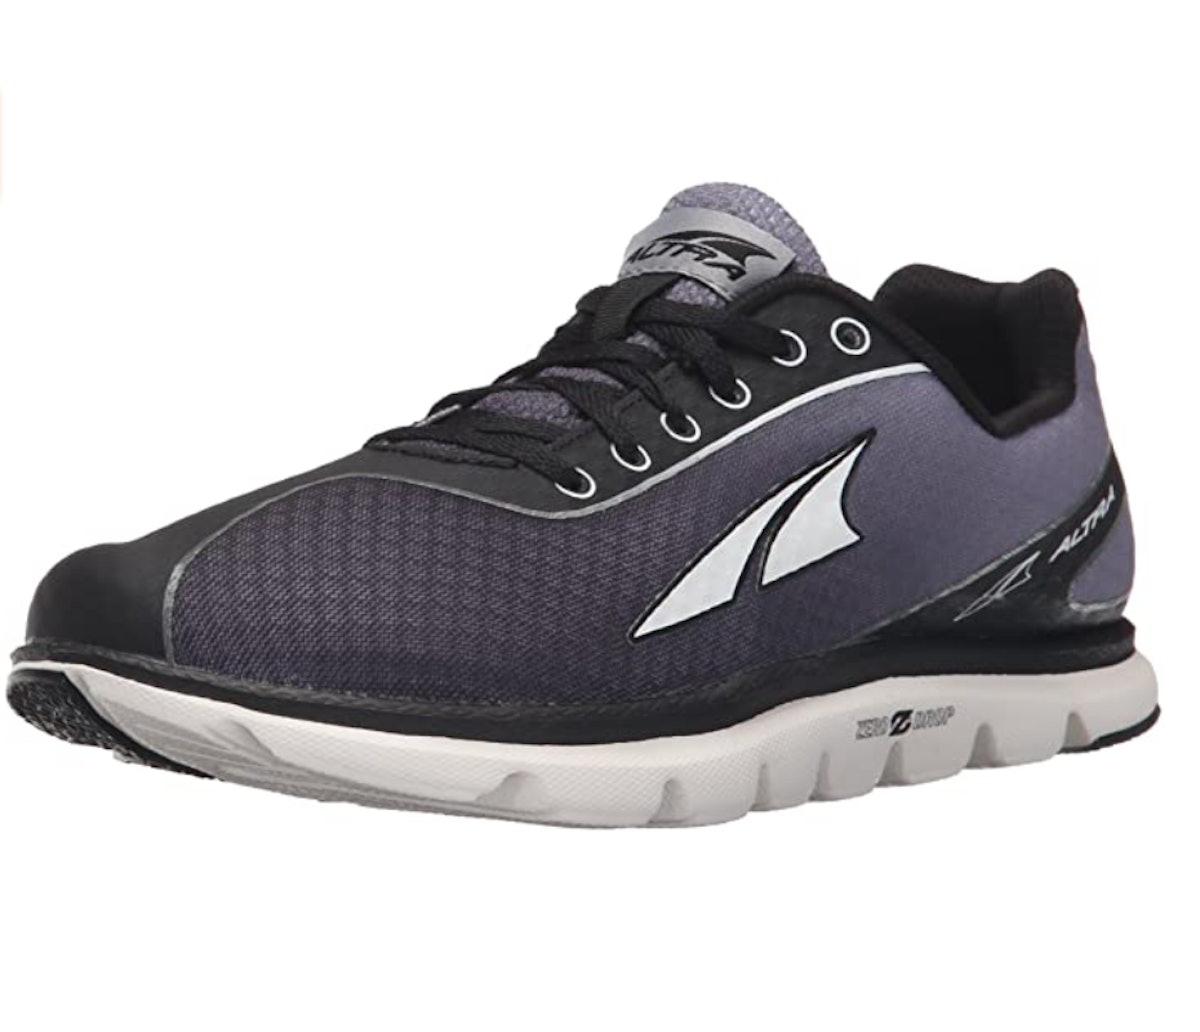 Altra Women's One 2.5 Running Shoe (5.2 Ounces)